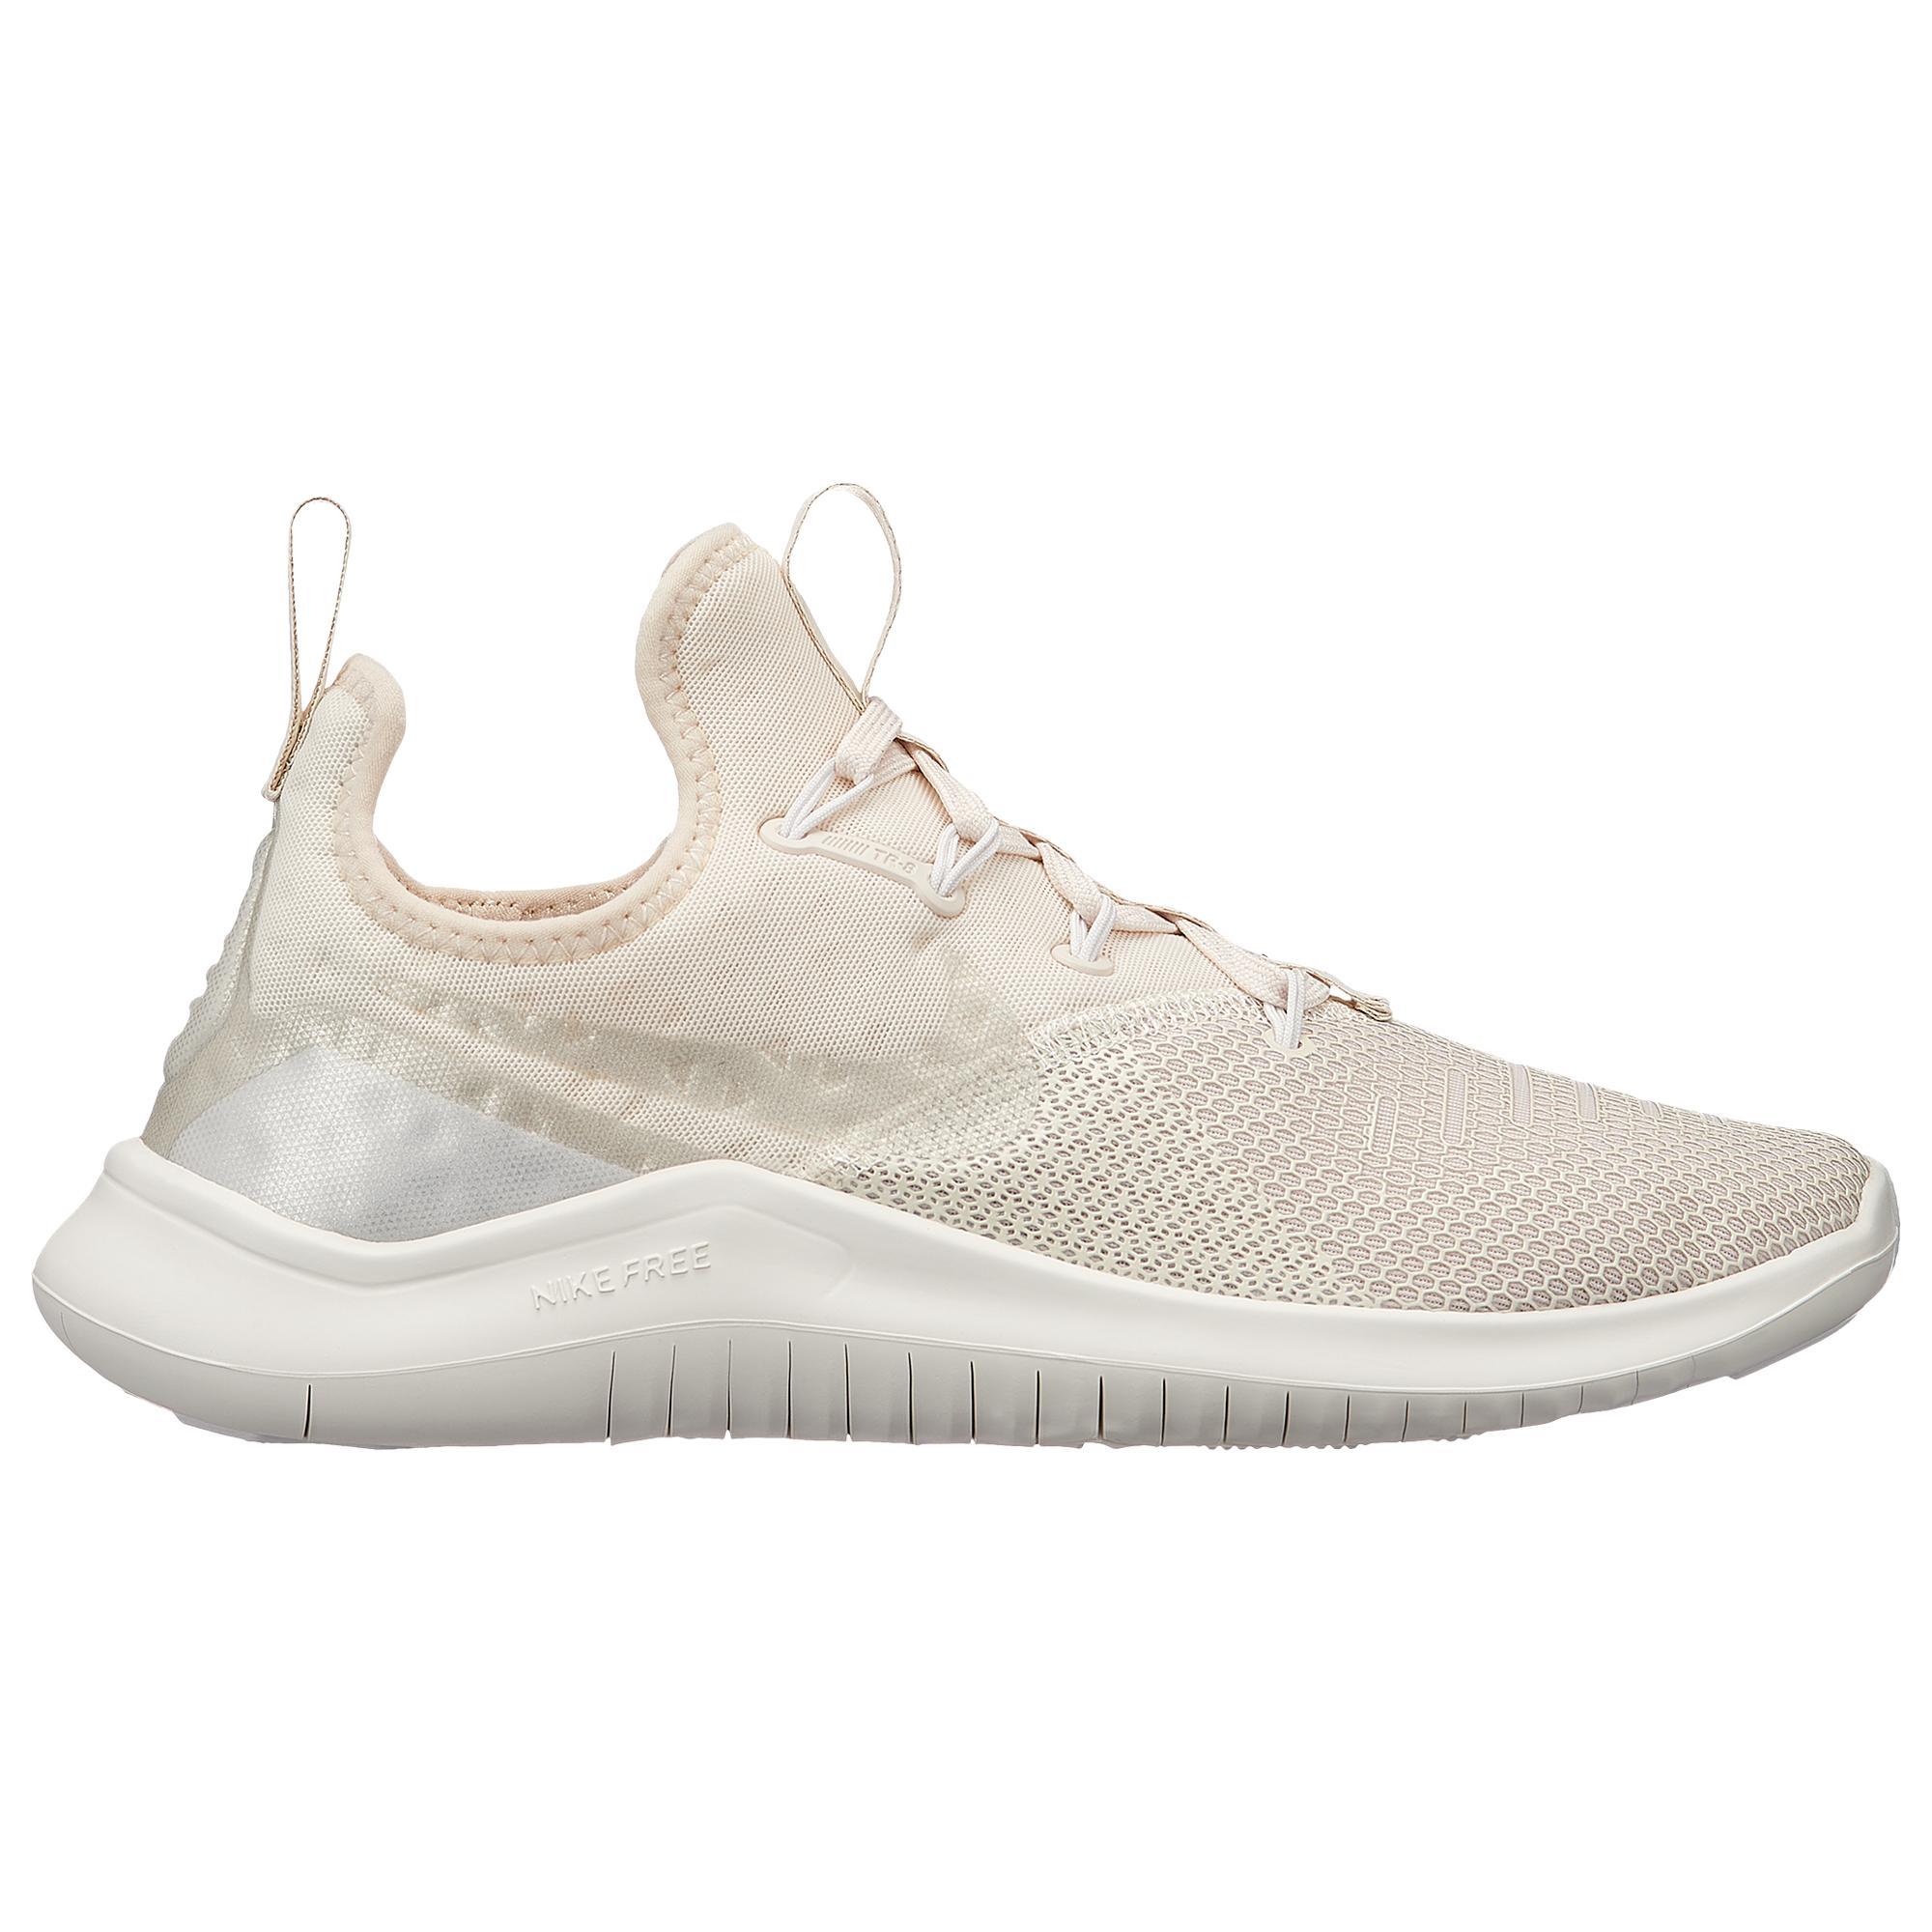 Nike Women's Free Tr 8 Training Shoe in